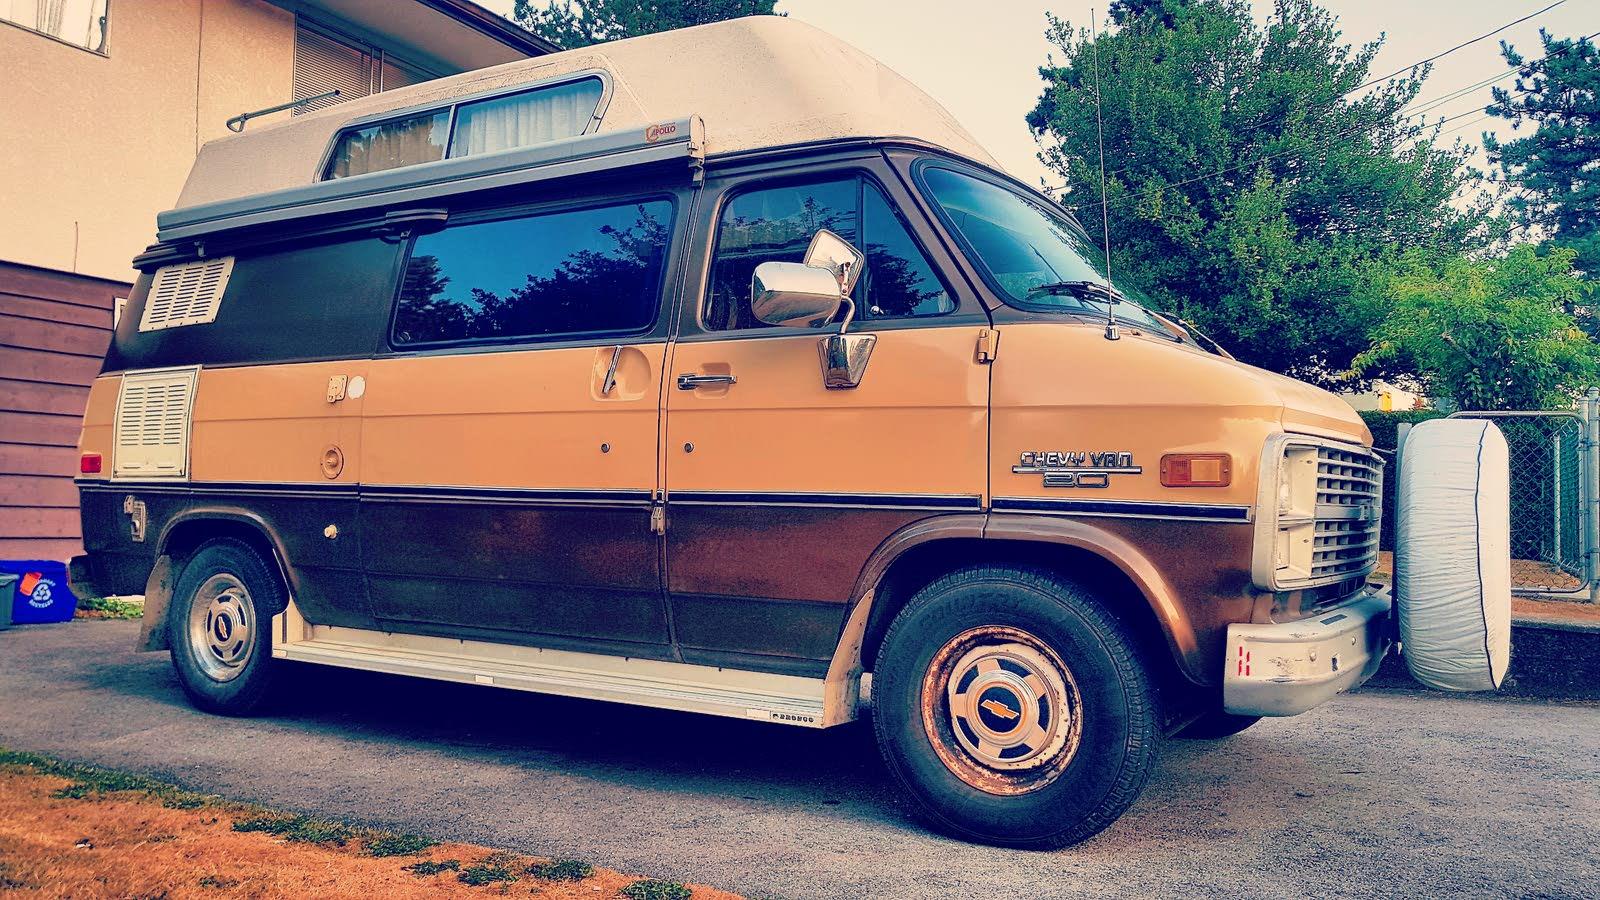 Chevrolet Chevy Van Questions Low Beam Not Working Cargurus